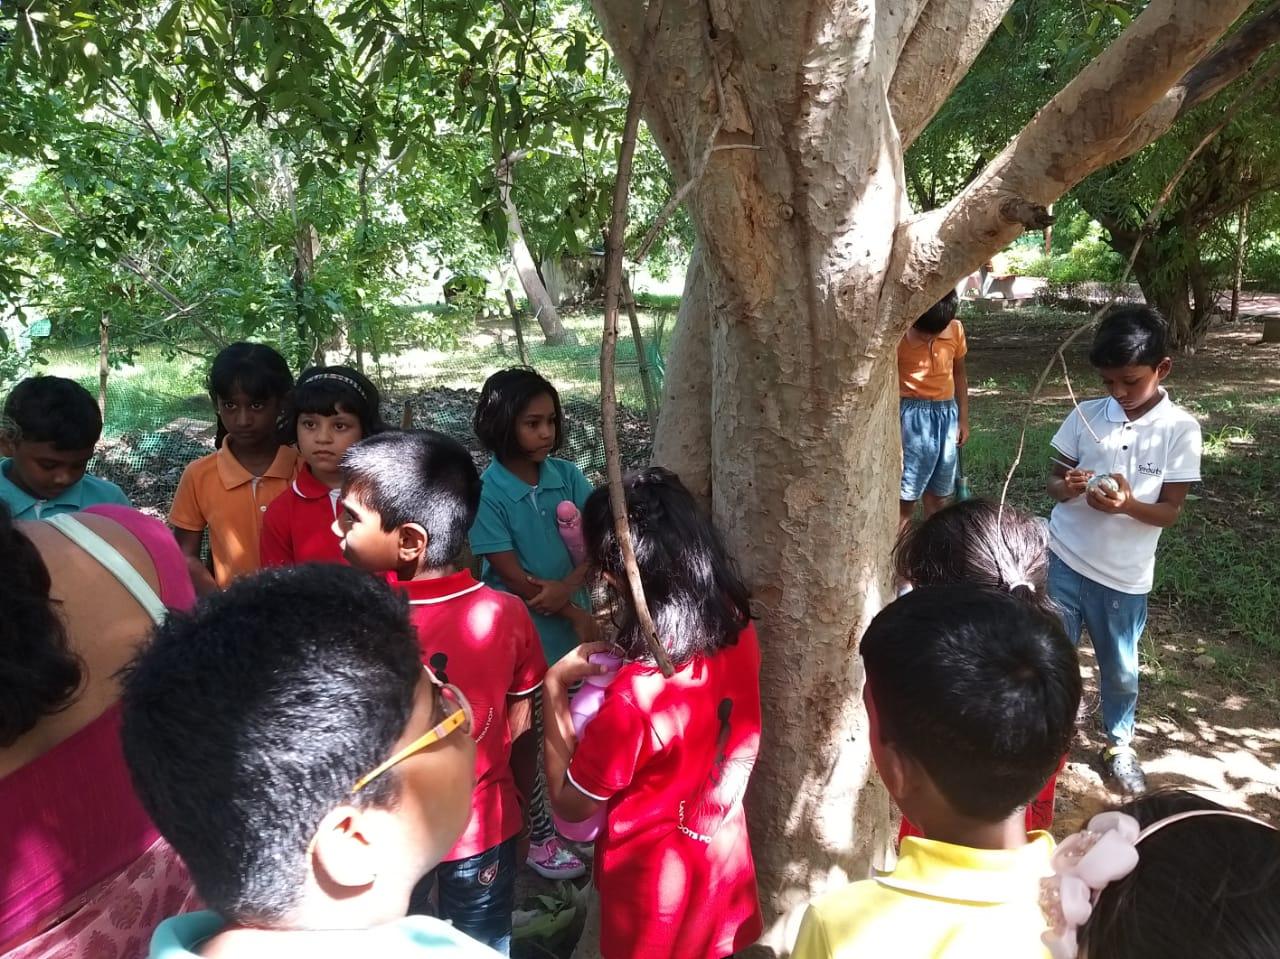 A day at the Kotturpuram Park